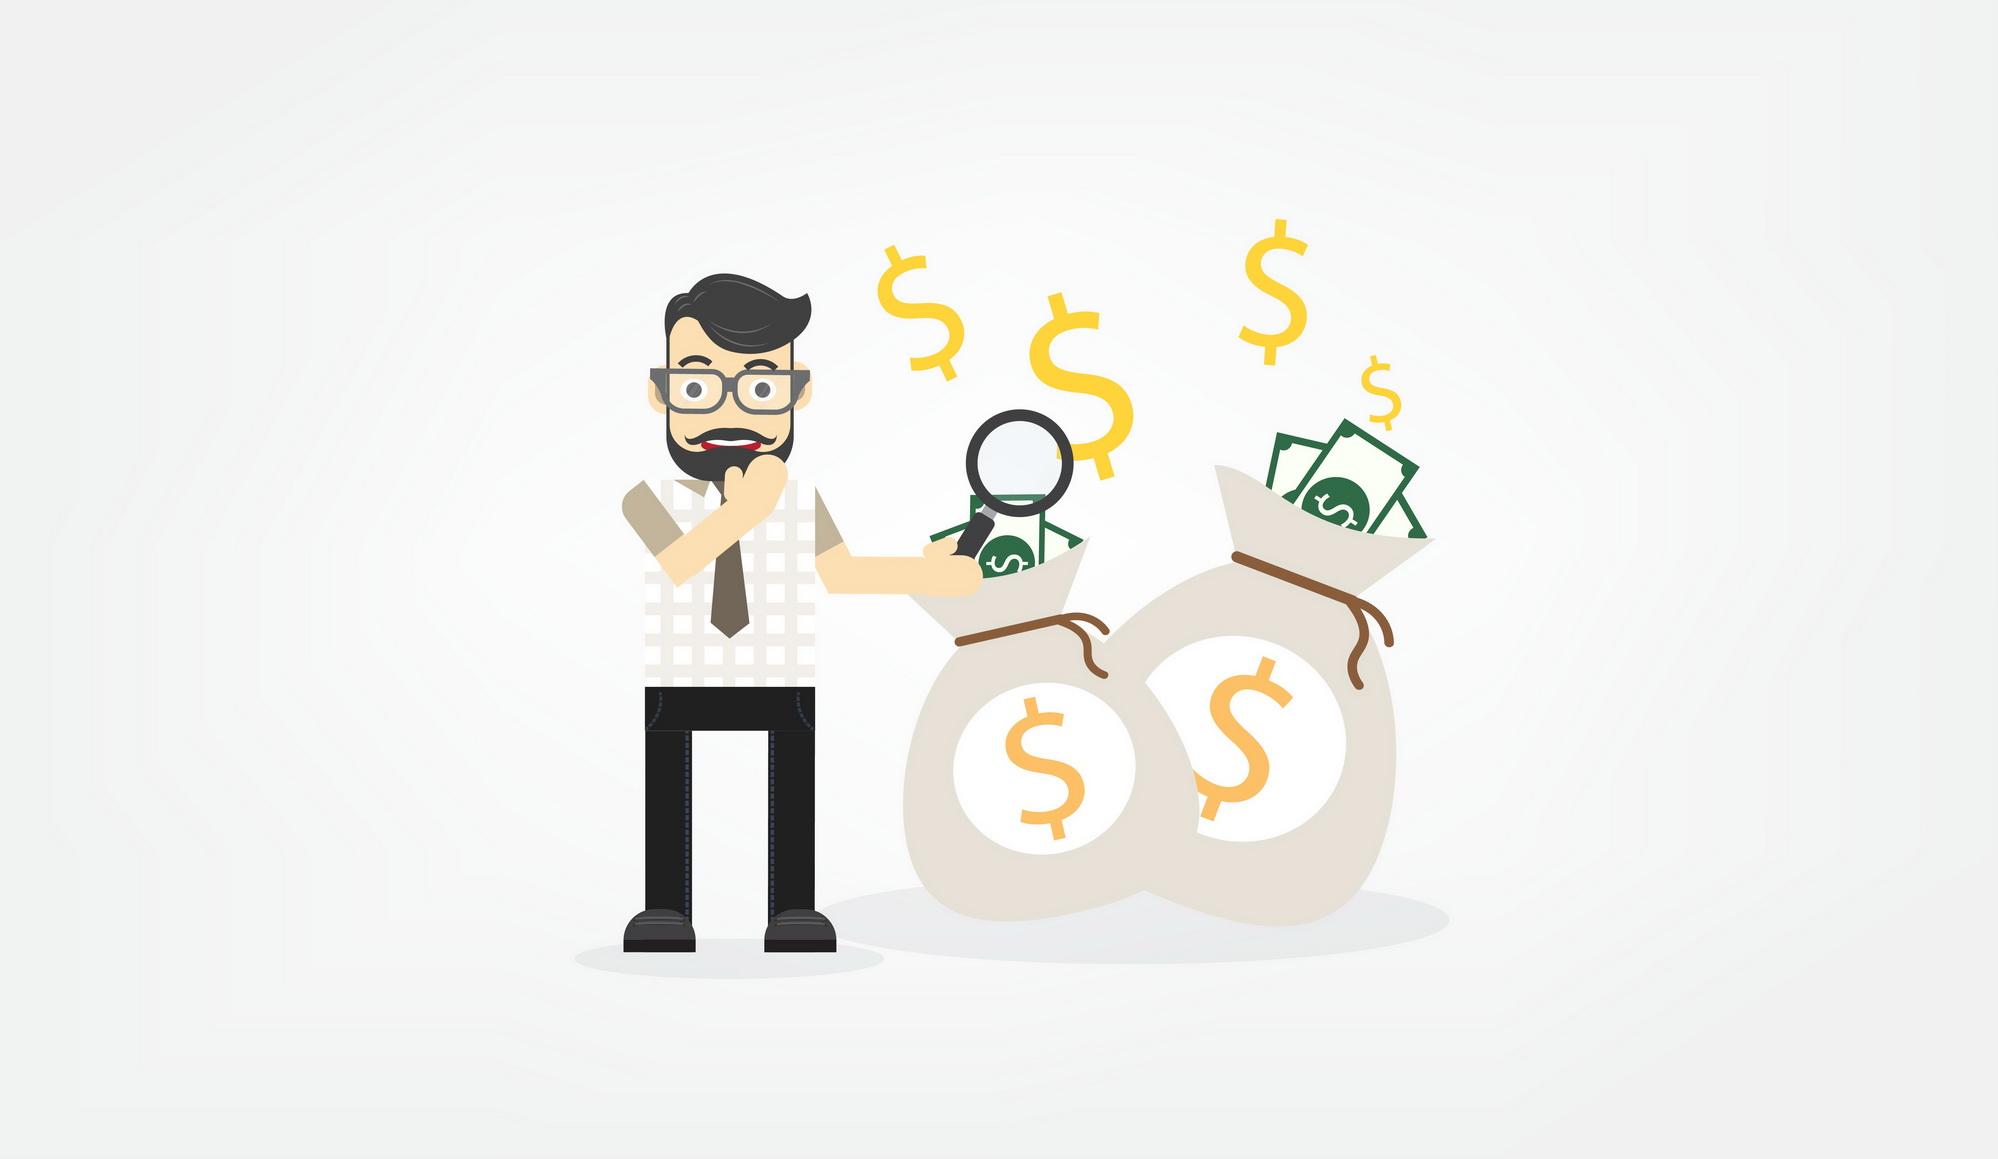 как взять кредит на развитие бизнеса с нуля в тинькофф